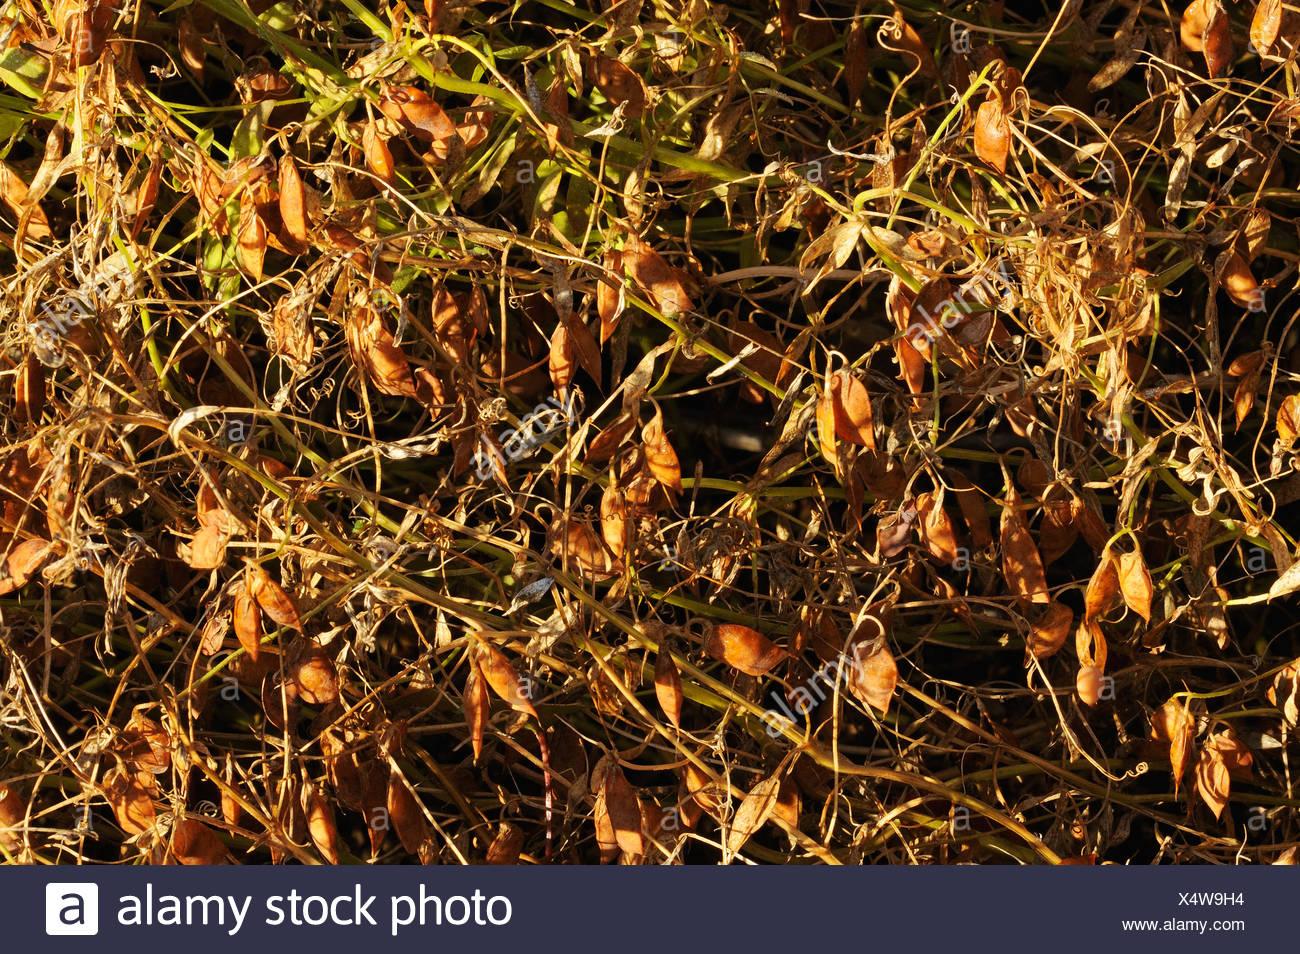 Brown lentils Webb Saskatchewan Canada - Stock Image